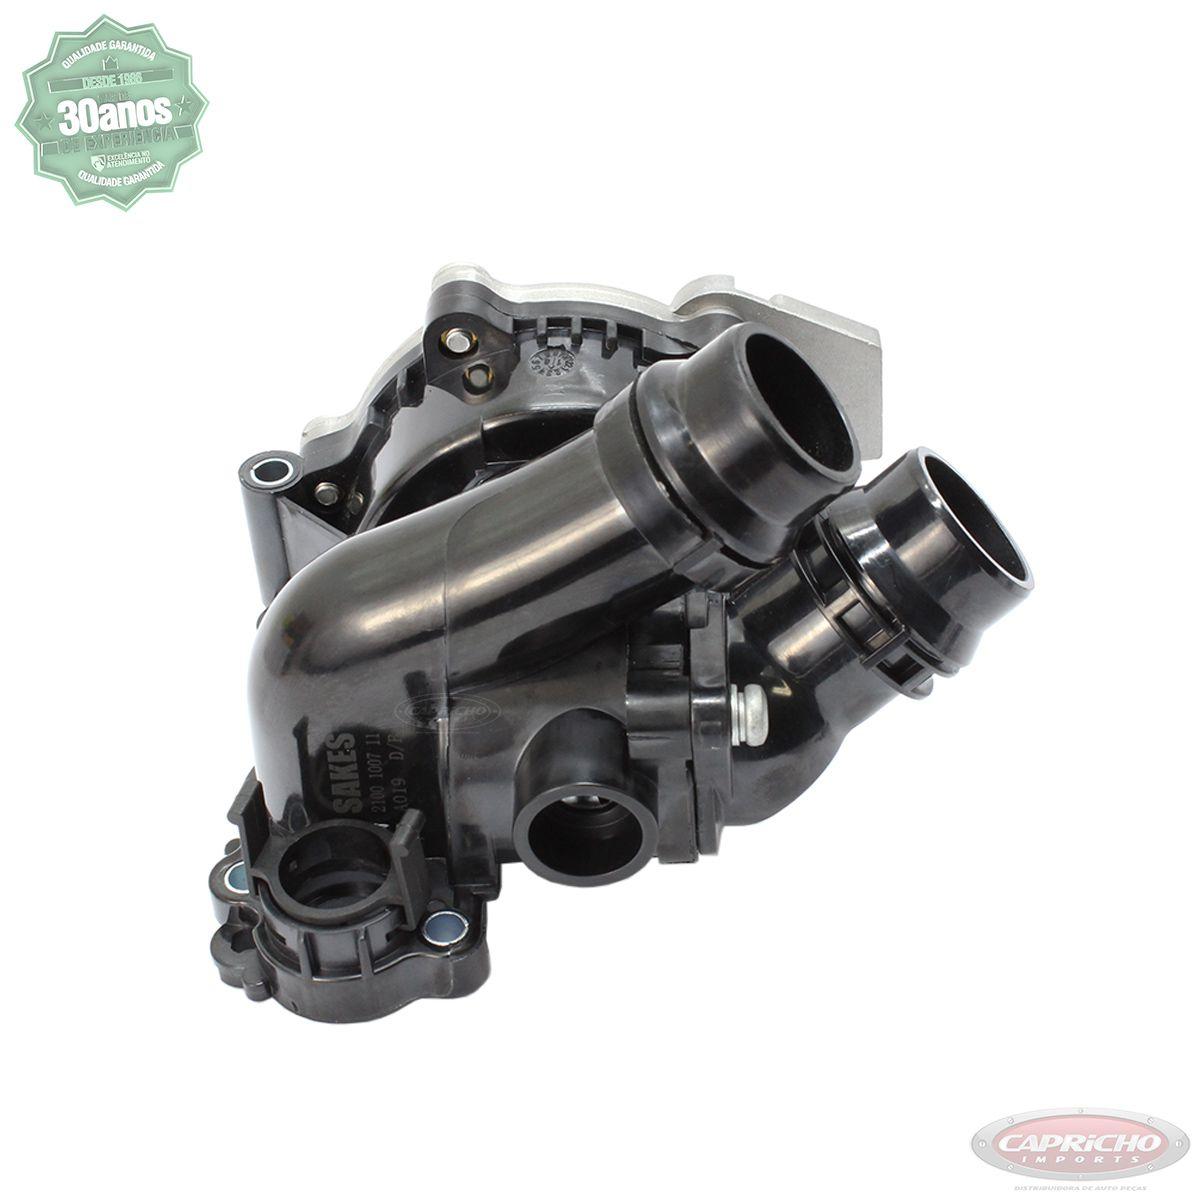 Bomba D'água Completa - Volkswagen / Audi